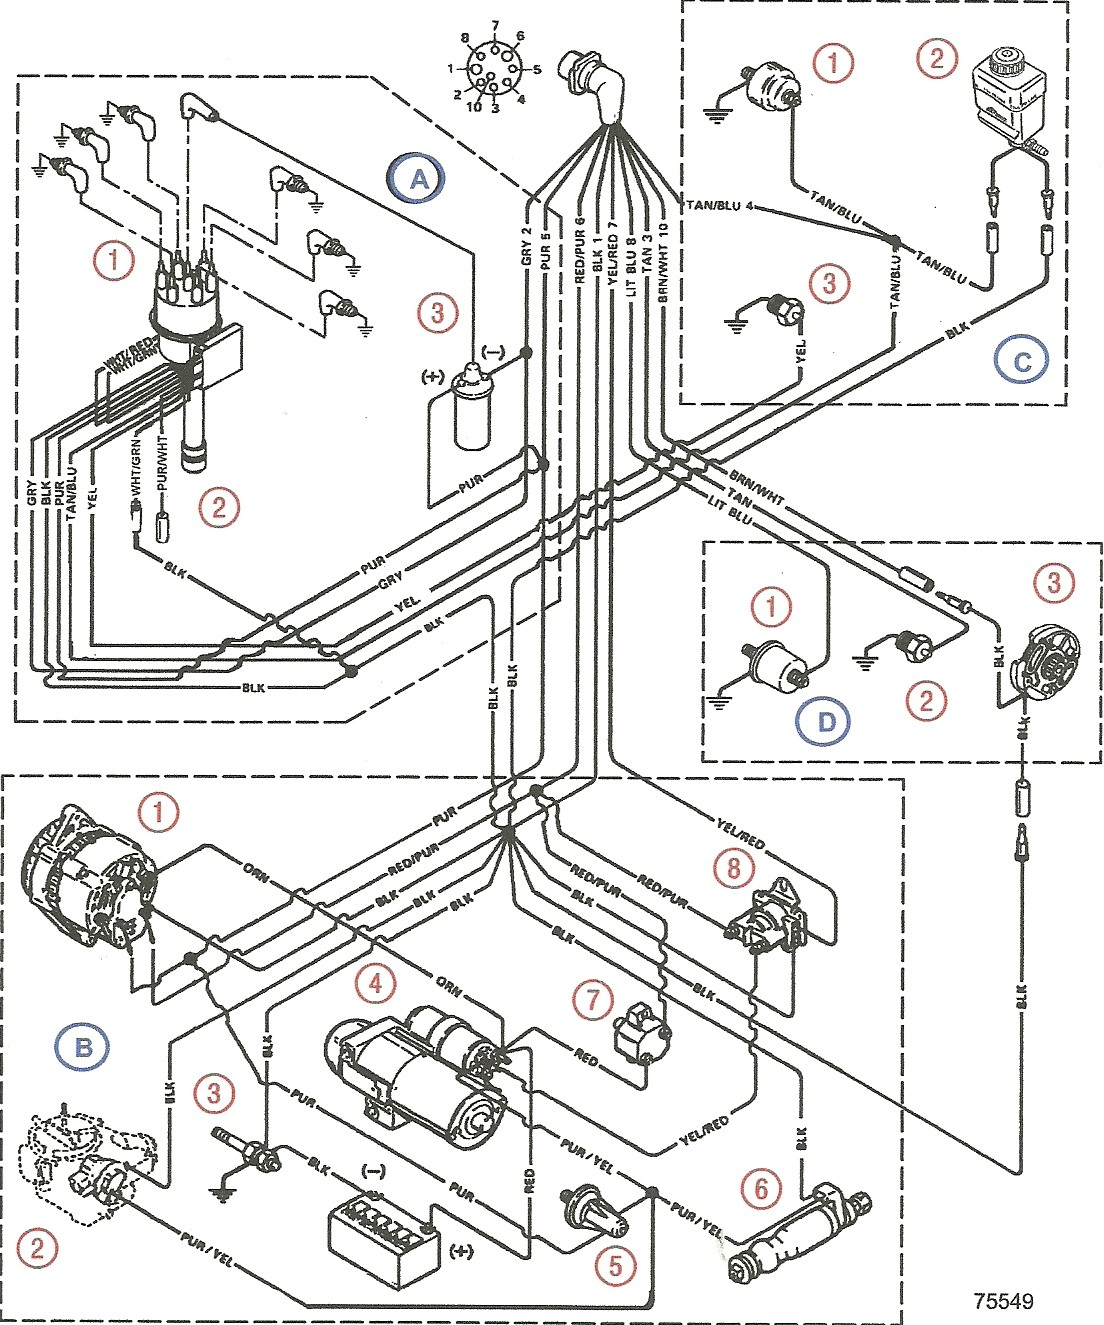 3 0 L Mercruiser Engine Diagram Best Mercruiser Wiring Diagram